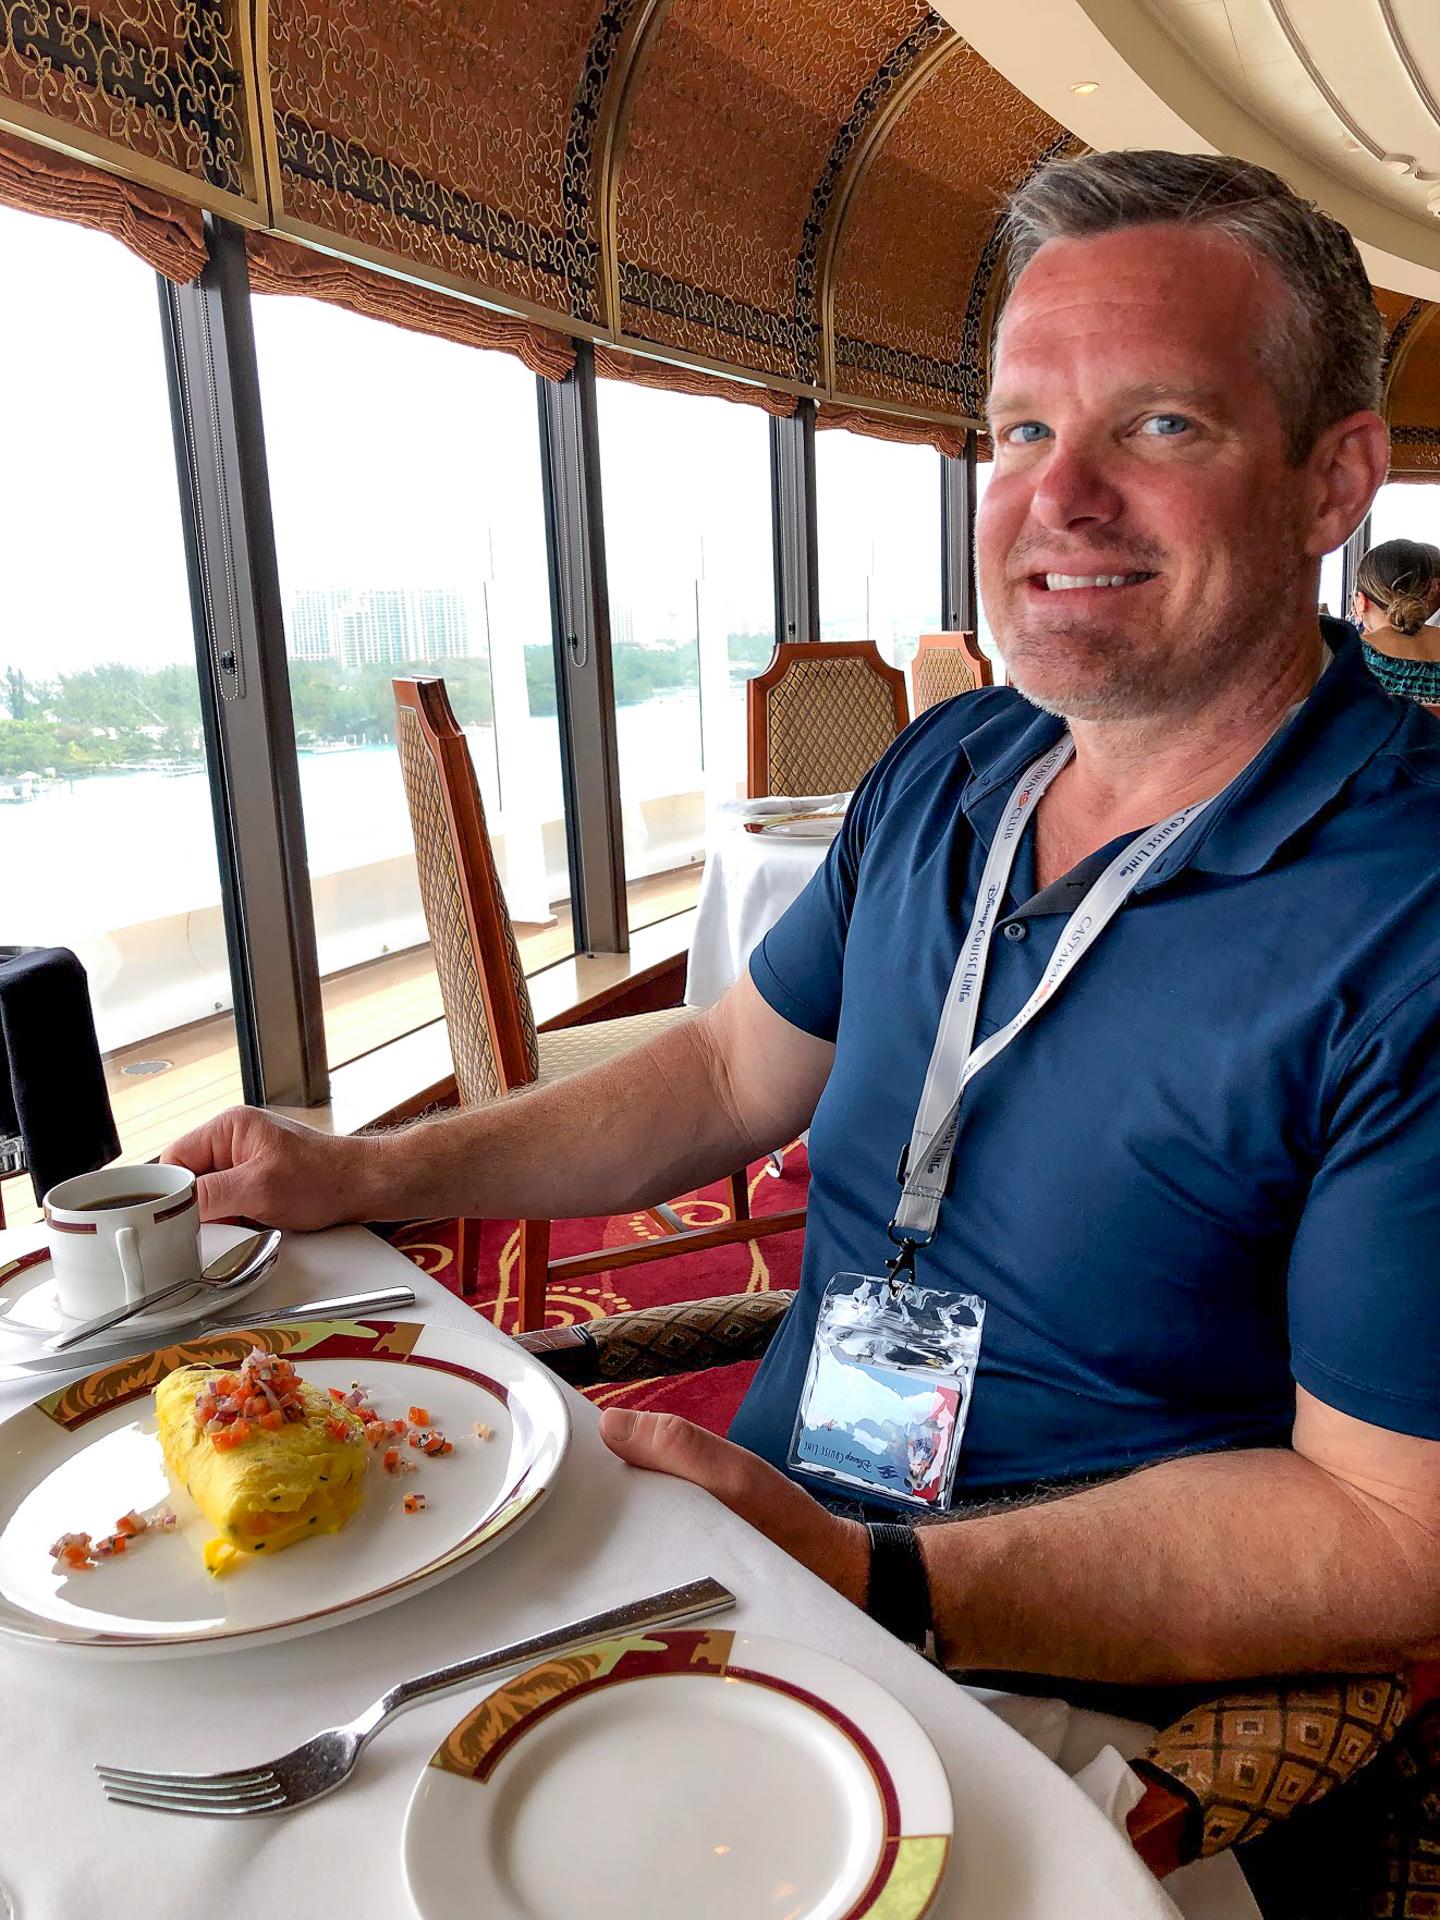 Man eating omelet at Palo brunch on the Disney Dream